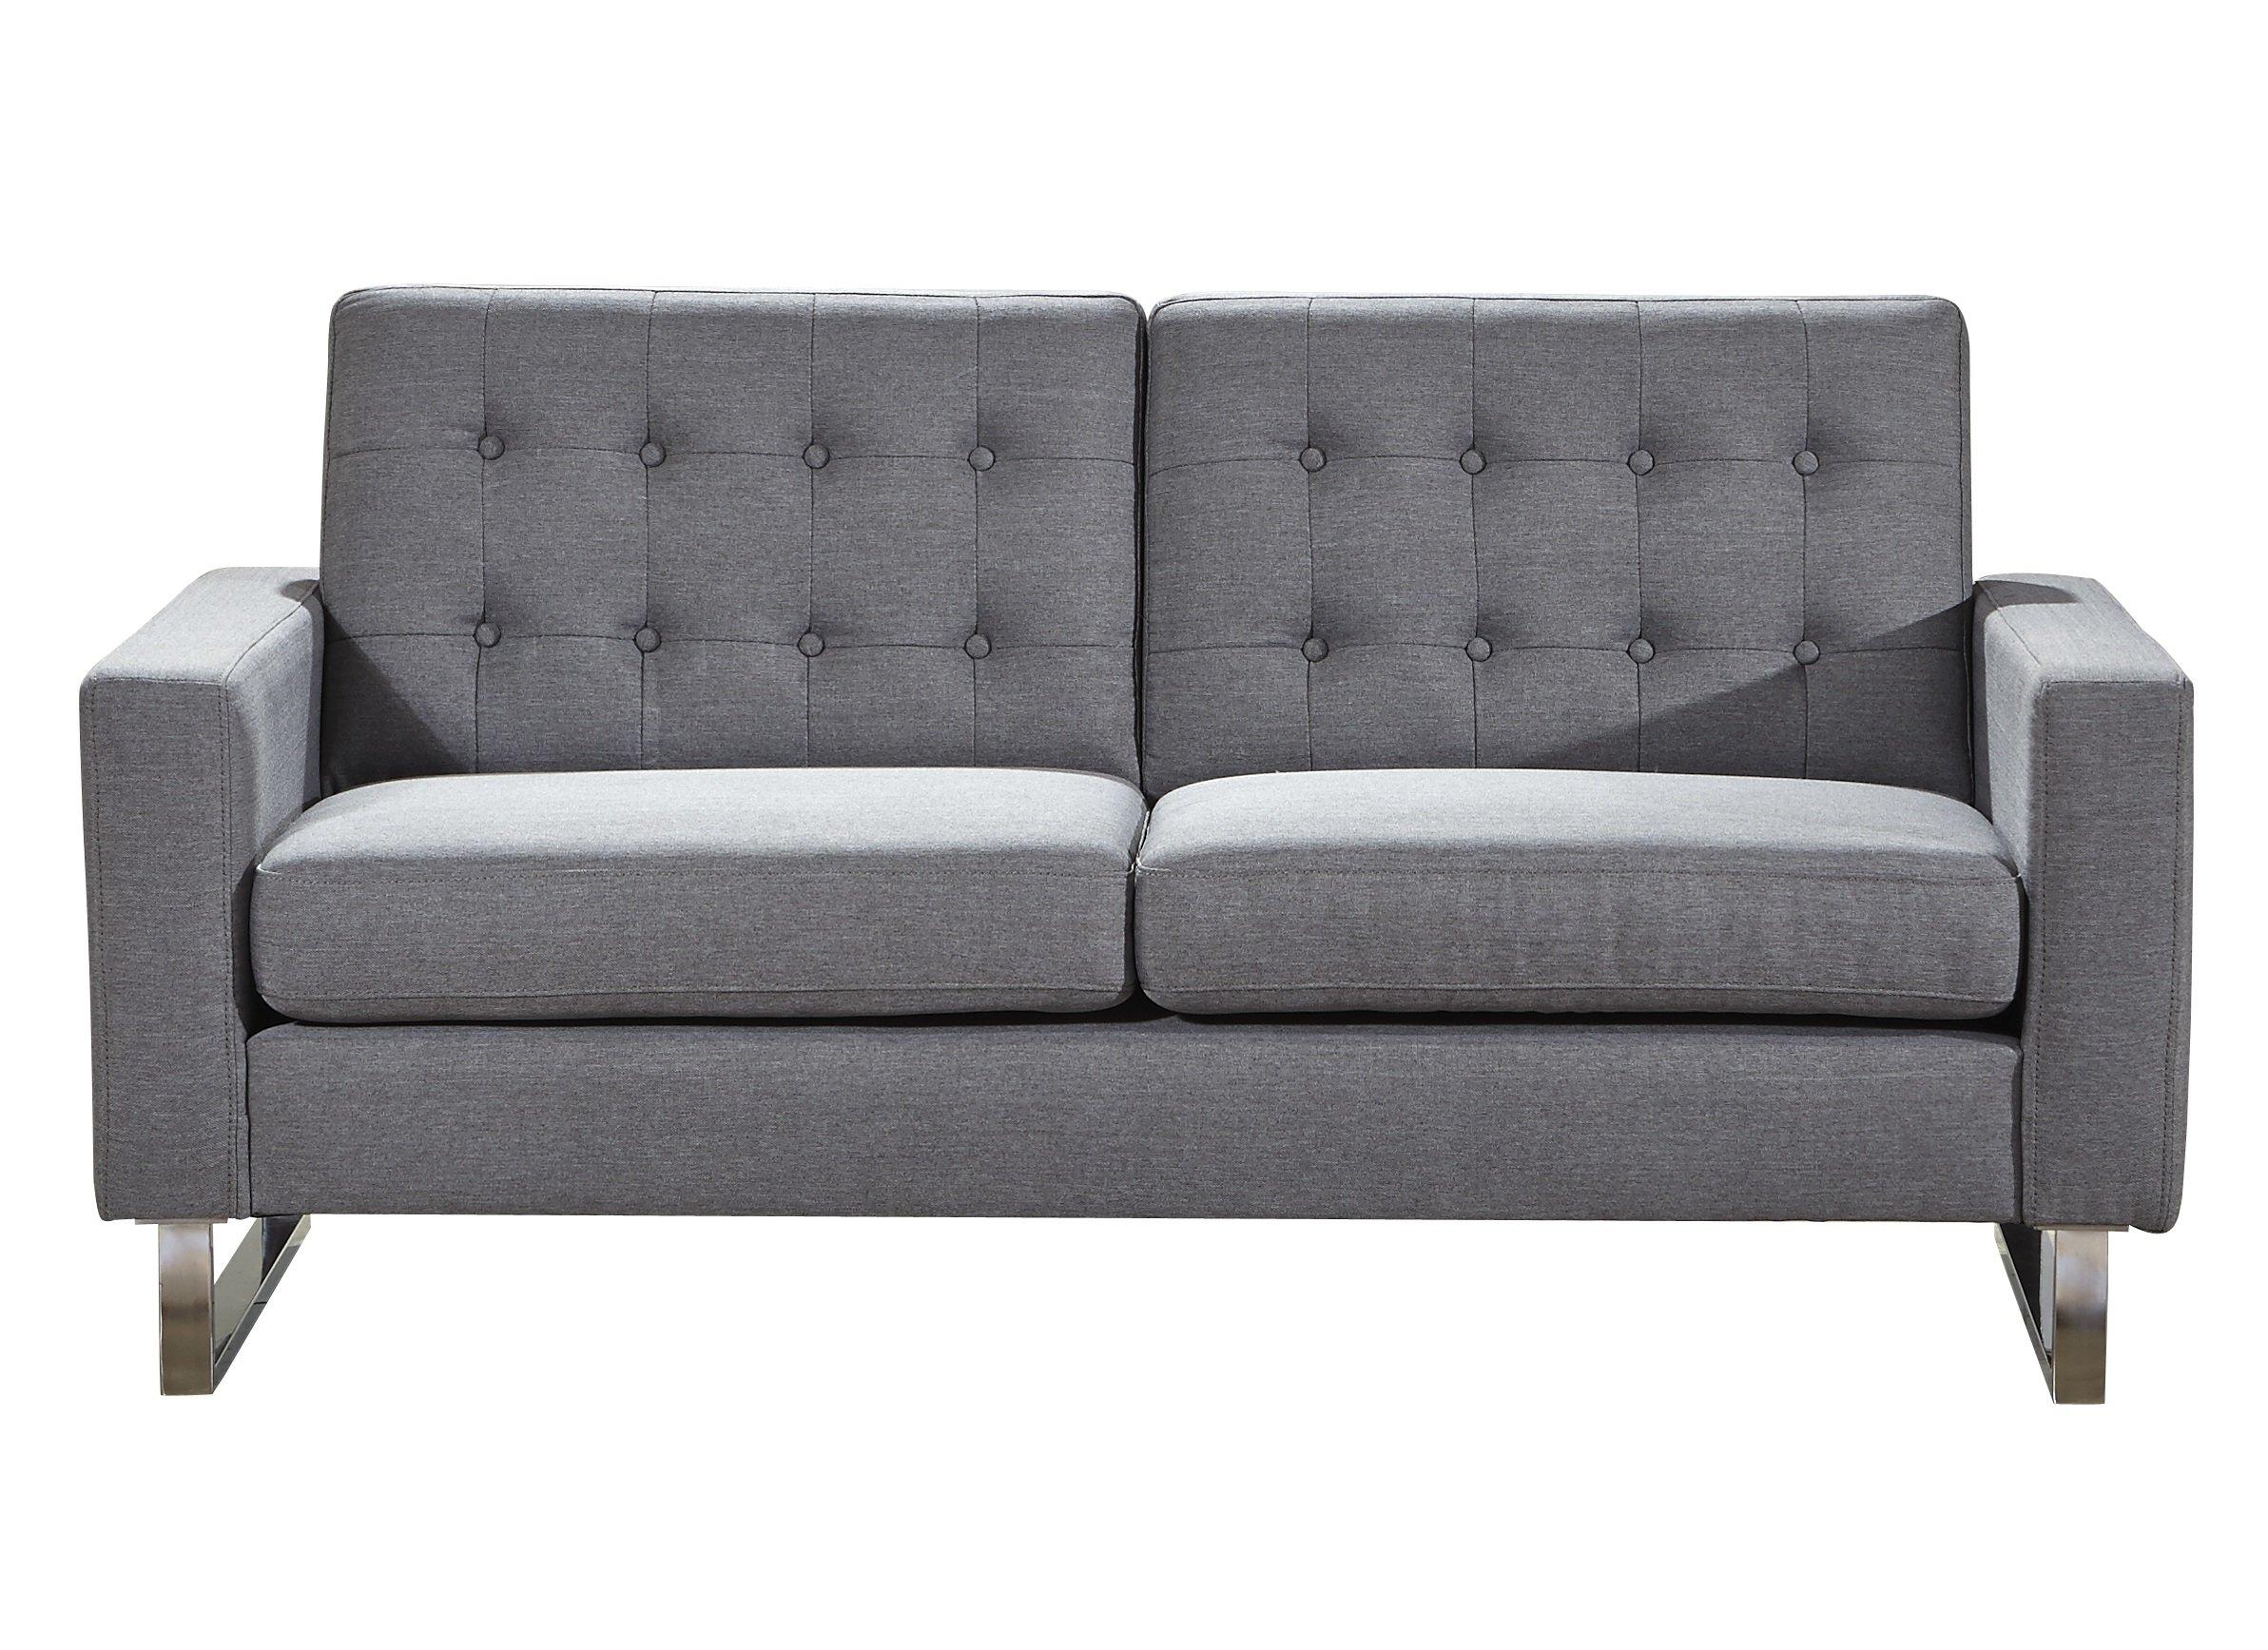 Wrought Studio Gwen Loveseat | Wayfair For Gwen Sofa Chairs (Image 20 of 20)